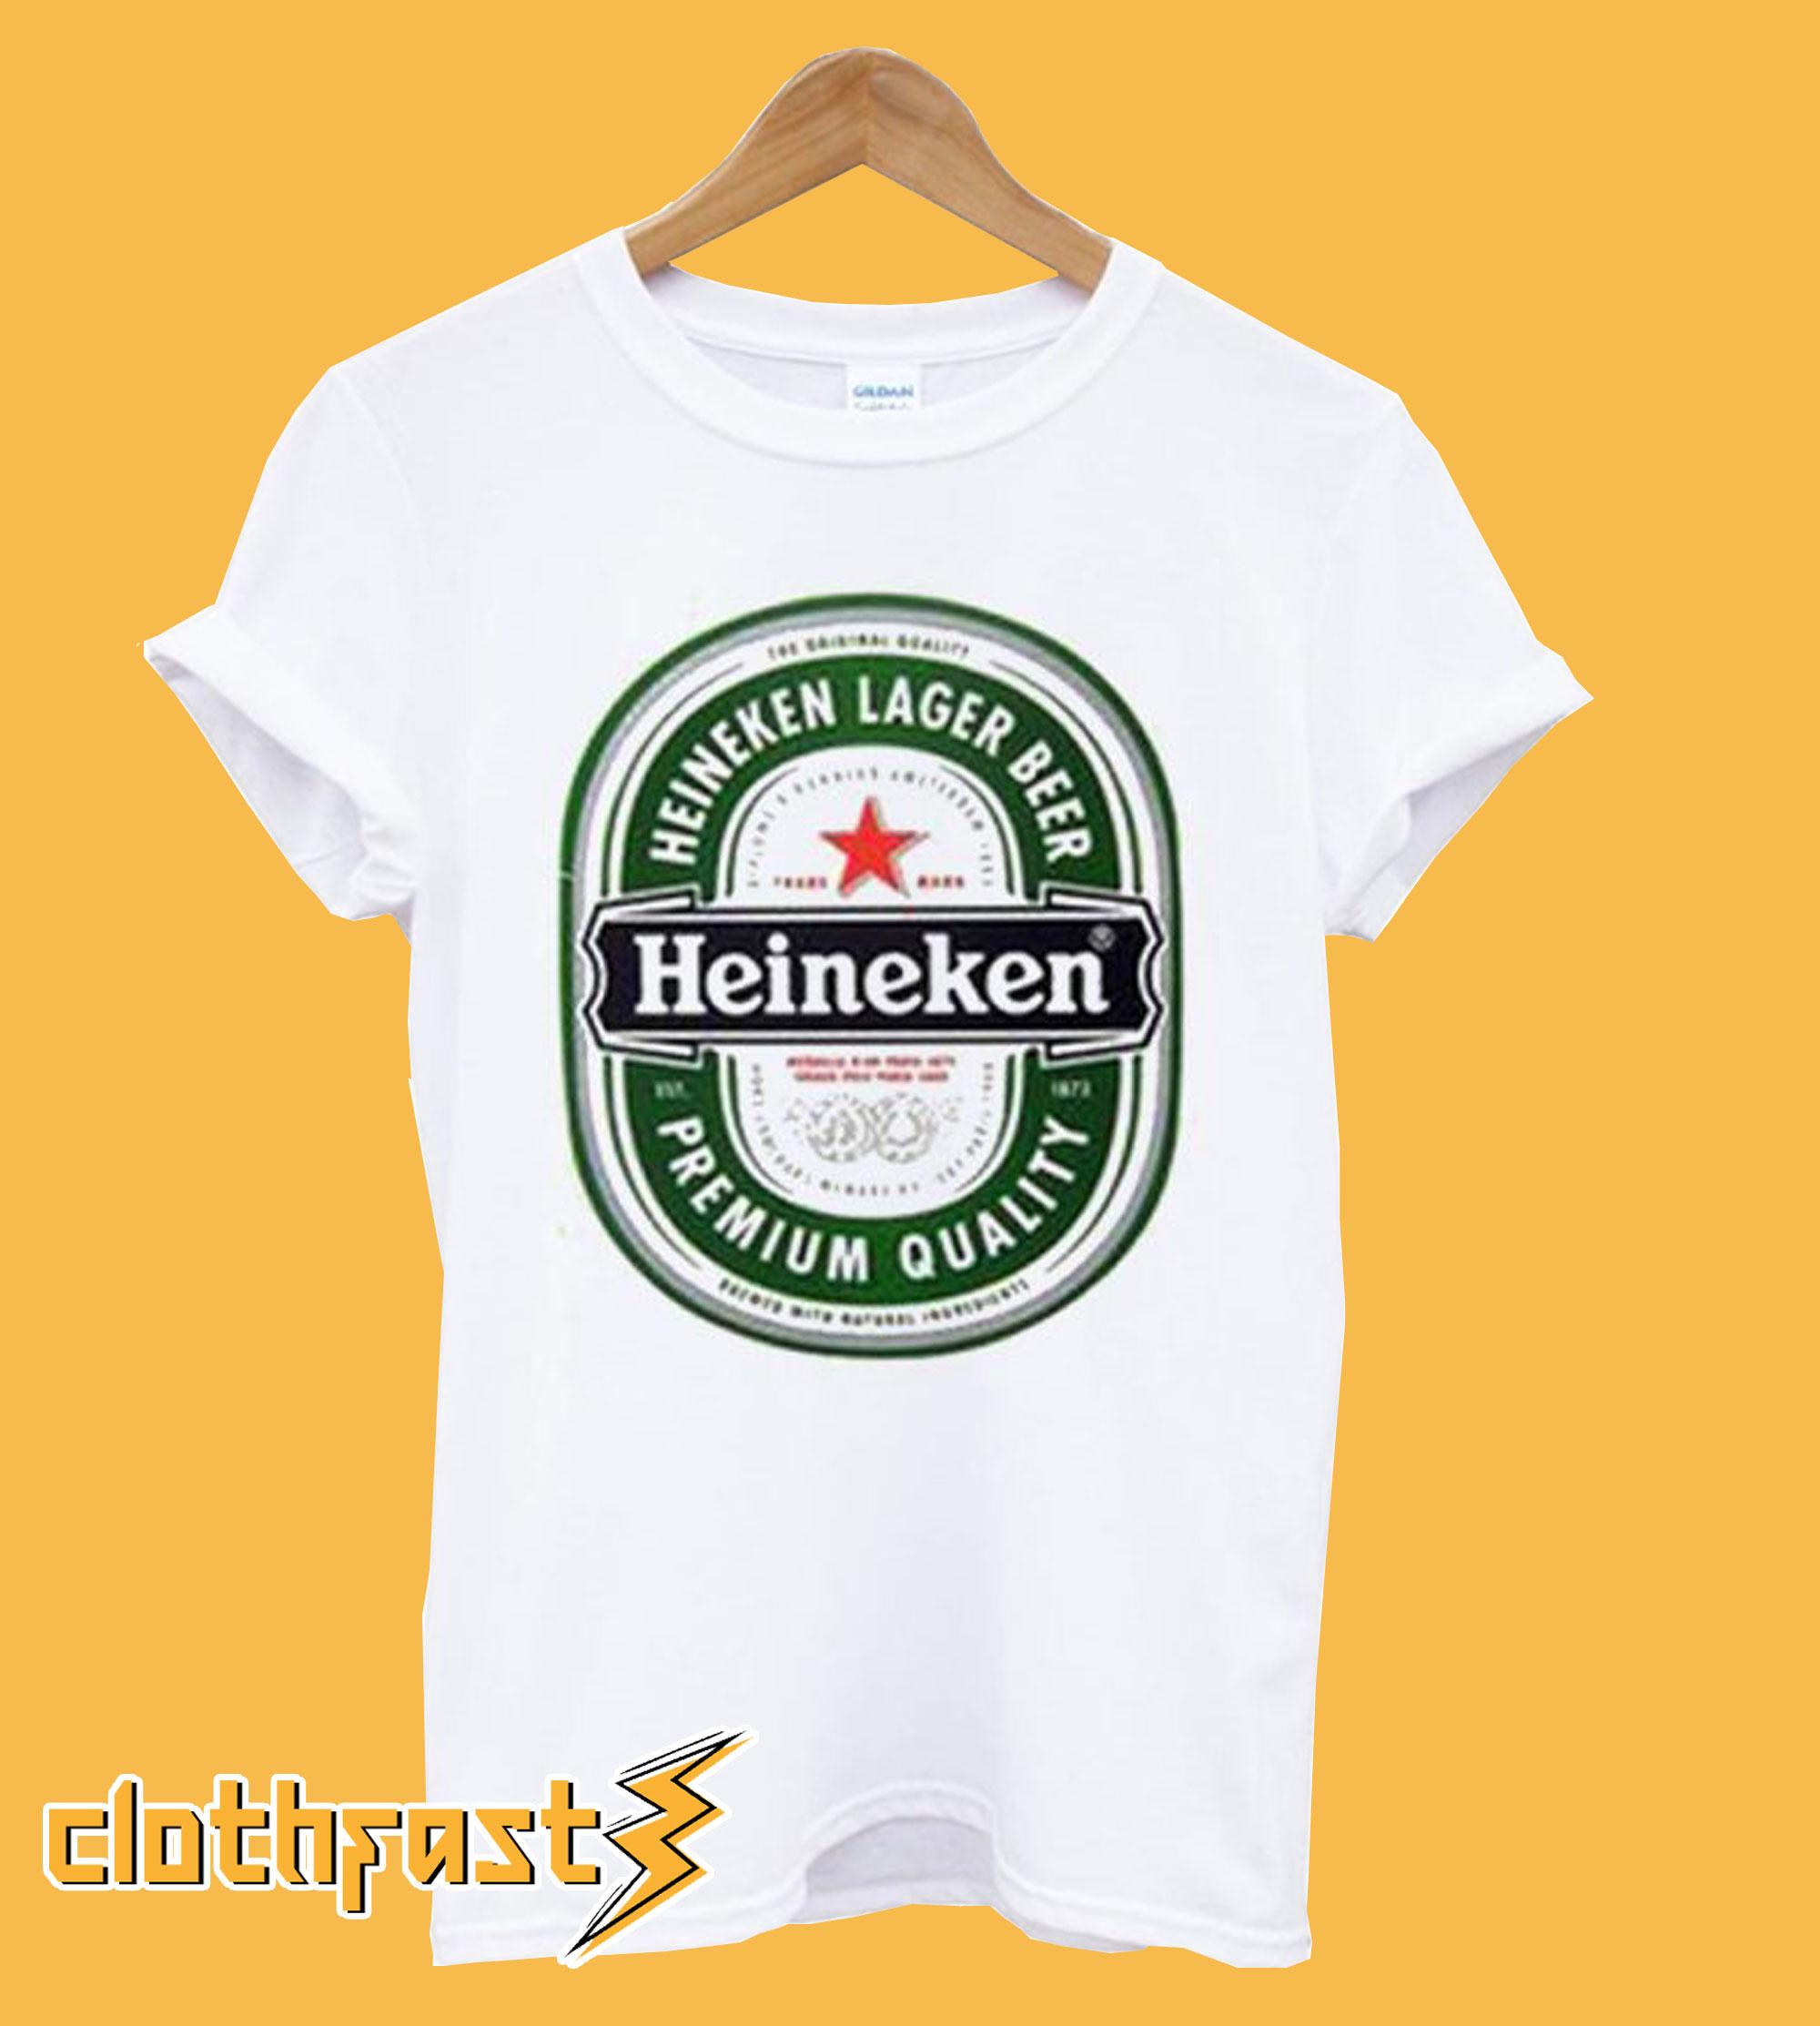 Heineken Lager Beer Heineken Premium Quality T shirt